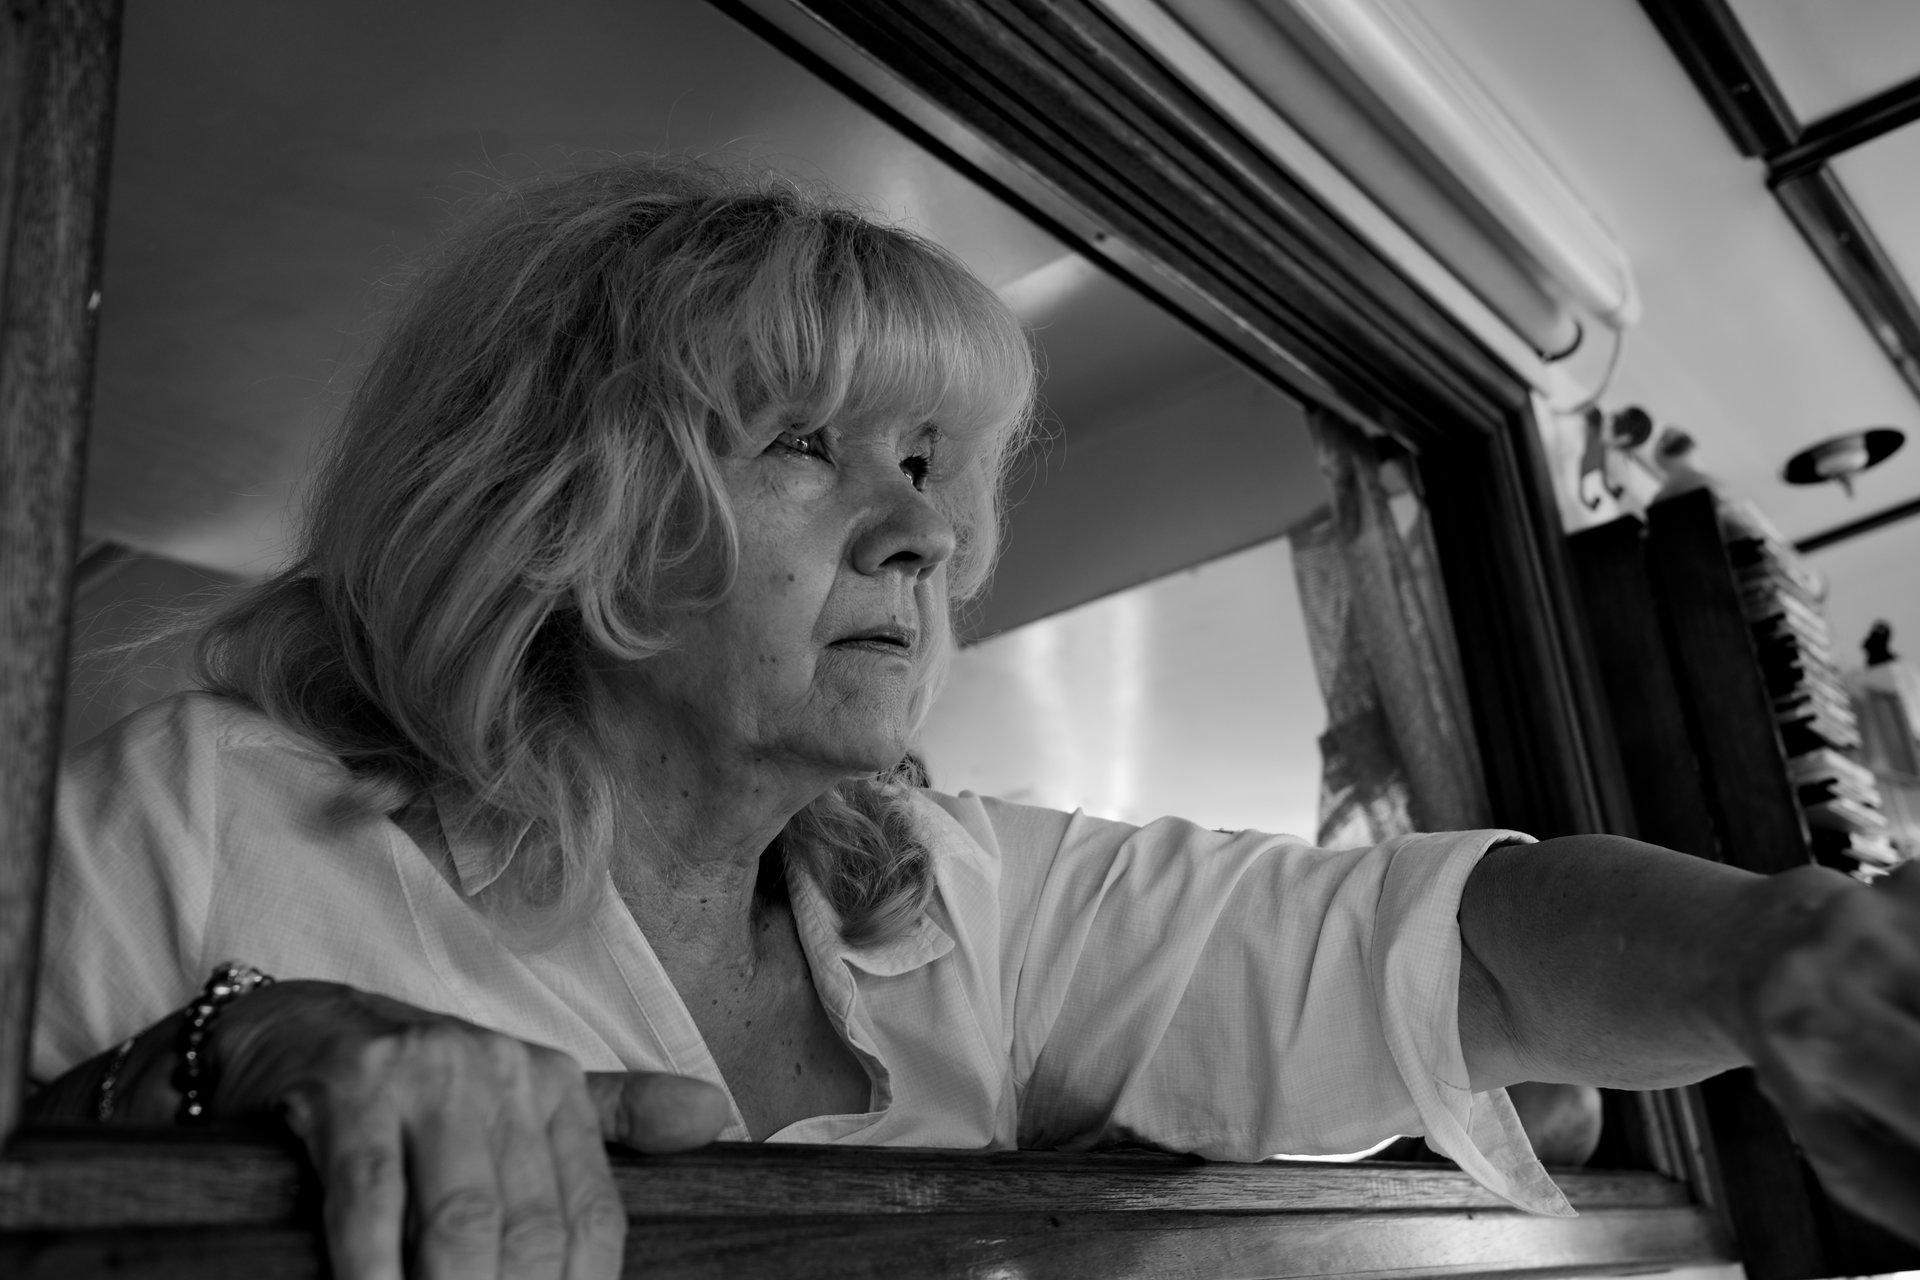 Photo in Portrait | Author Veska Saeva - veskas | PHOTO FORUM